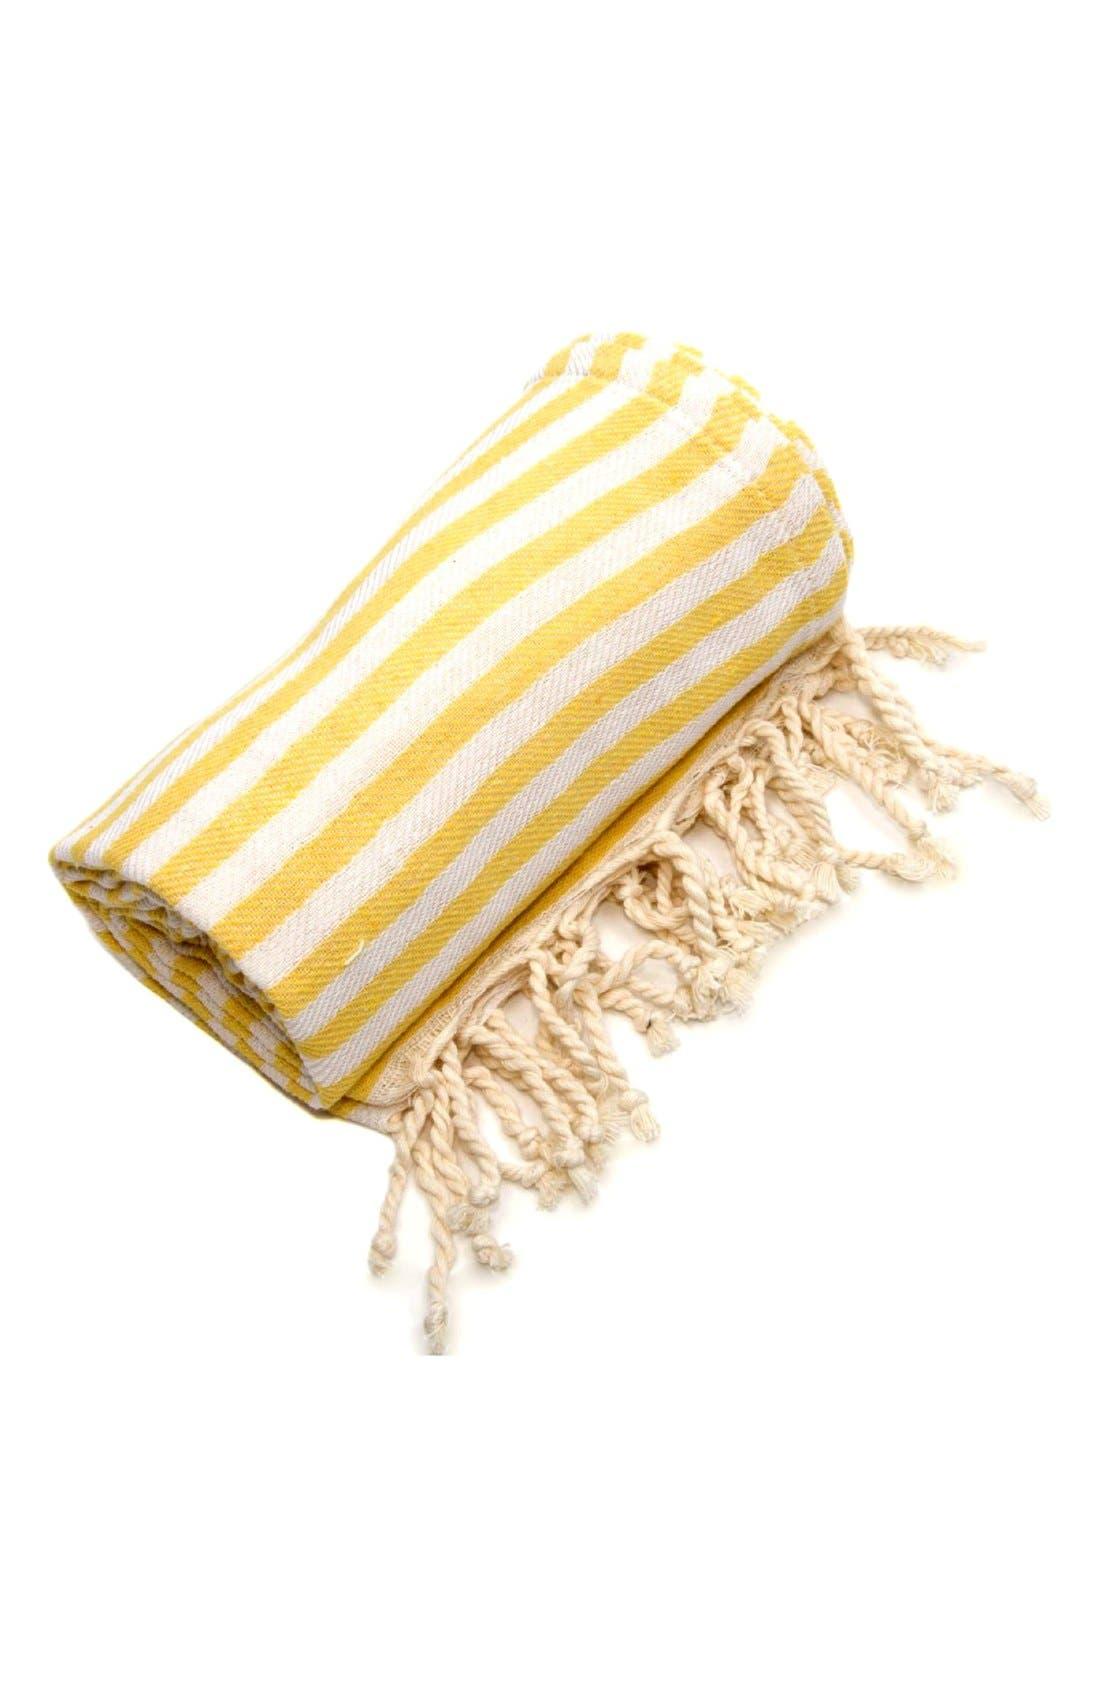 'Fun in the Sun' Turkish Pestemal Towel,                             Alternate thumbnail 2, color,                             Sunshine Yellow